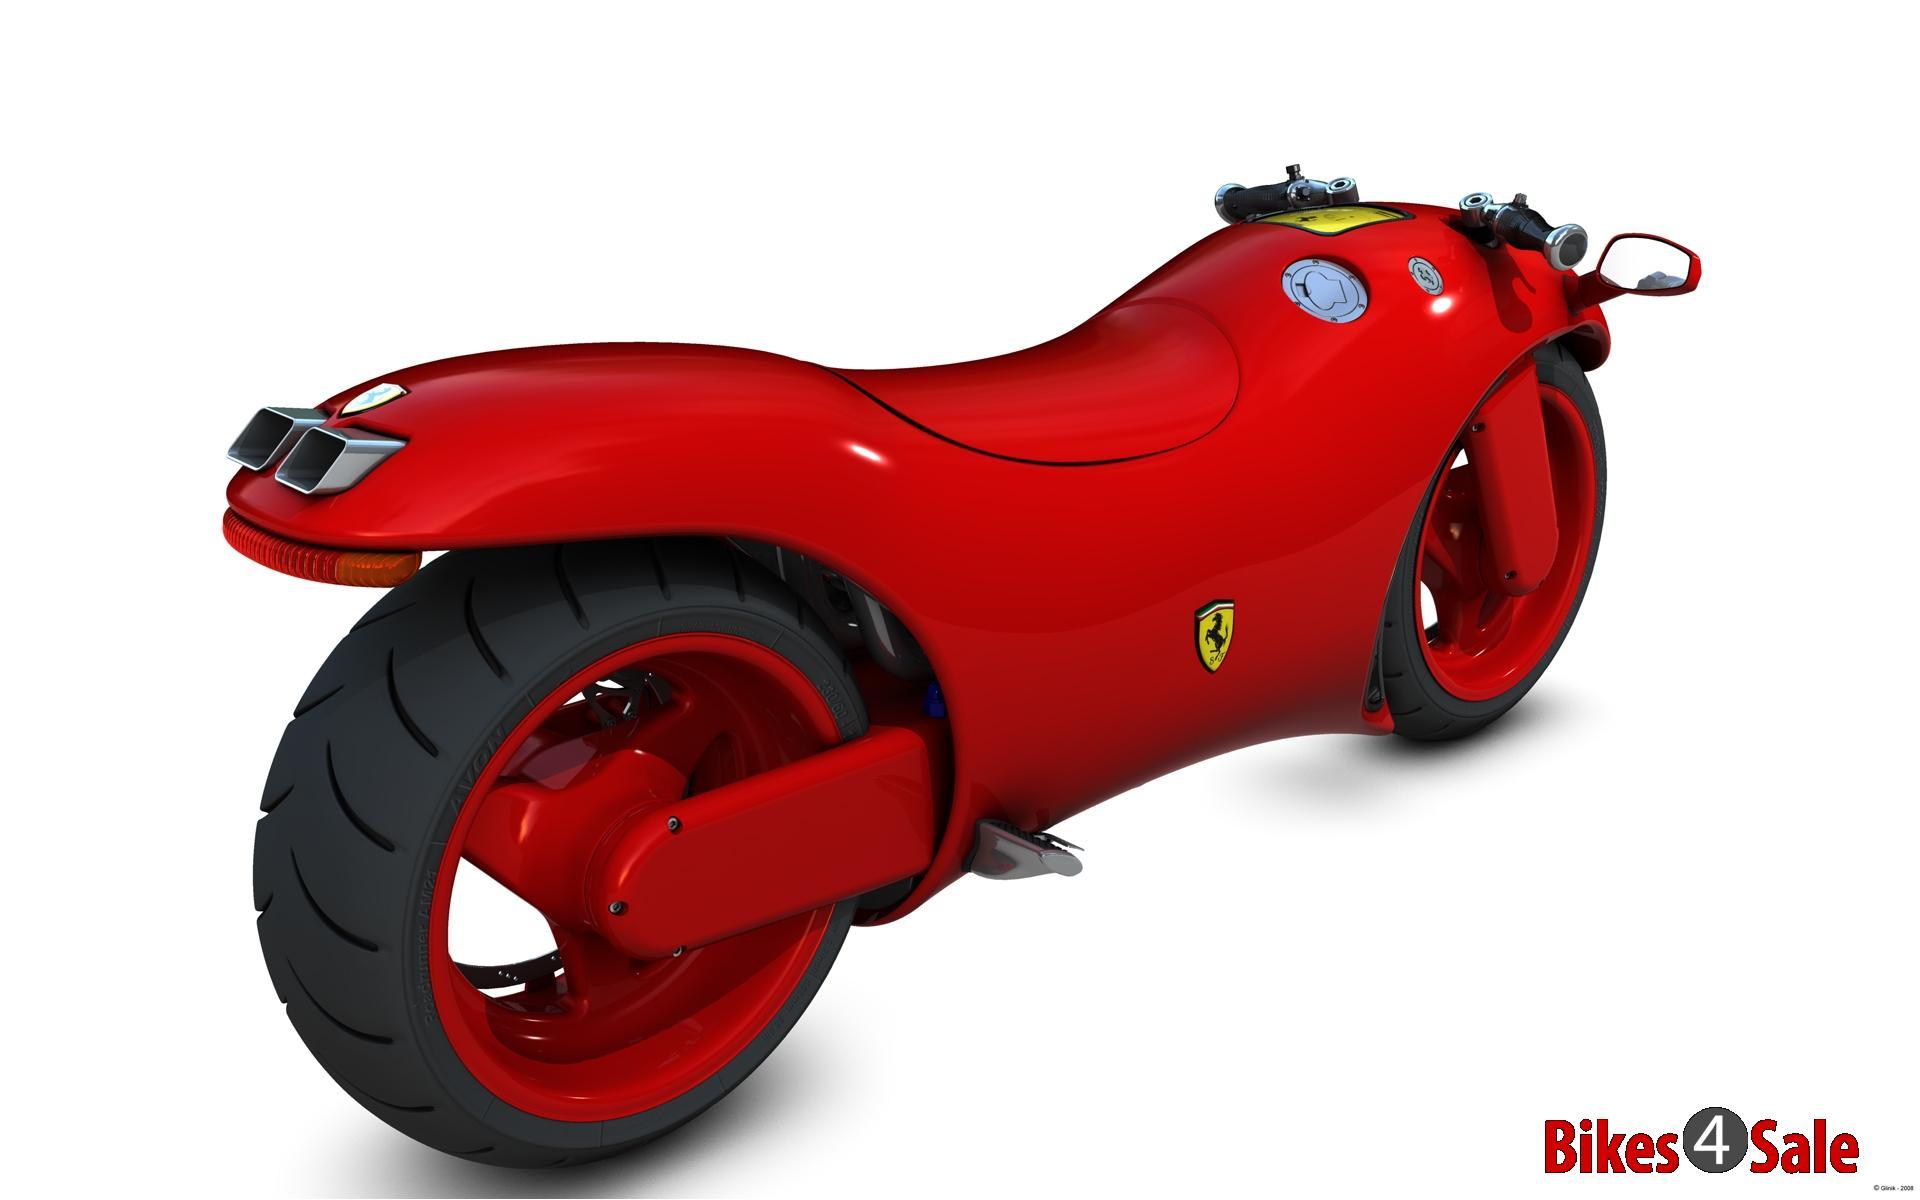 ferrari's concept two-wheeler - bikes4sale